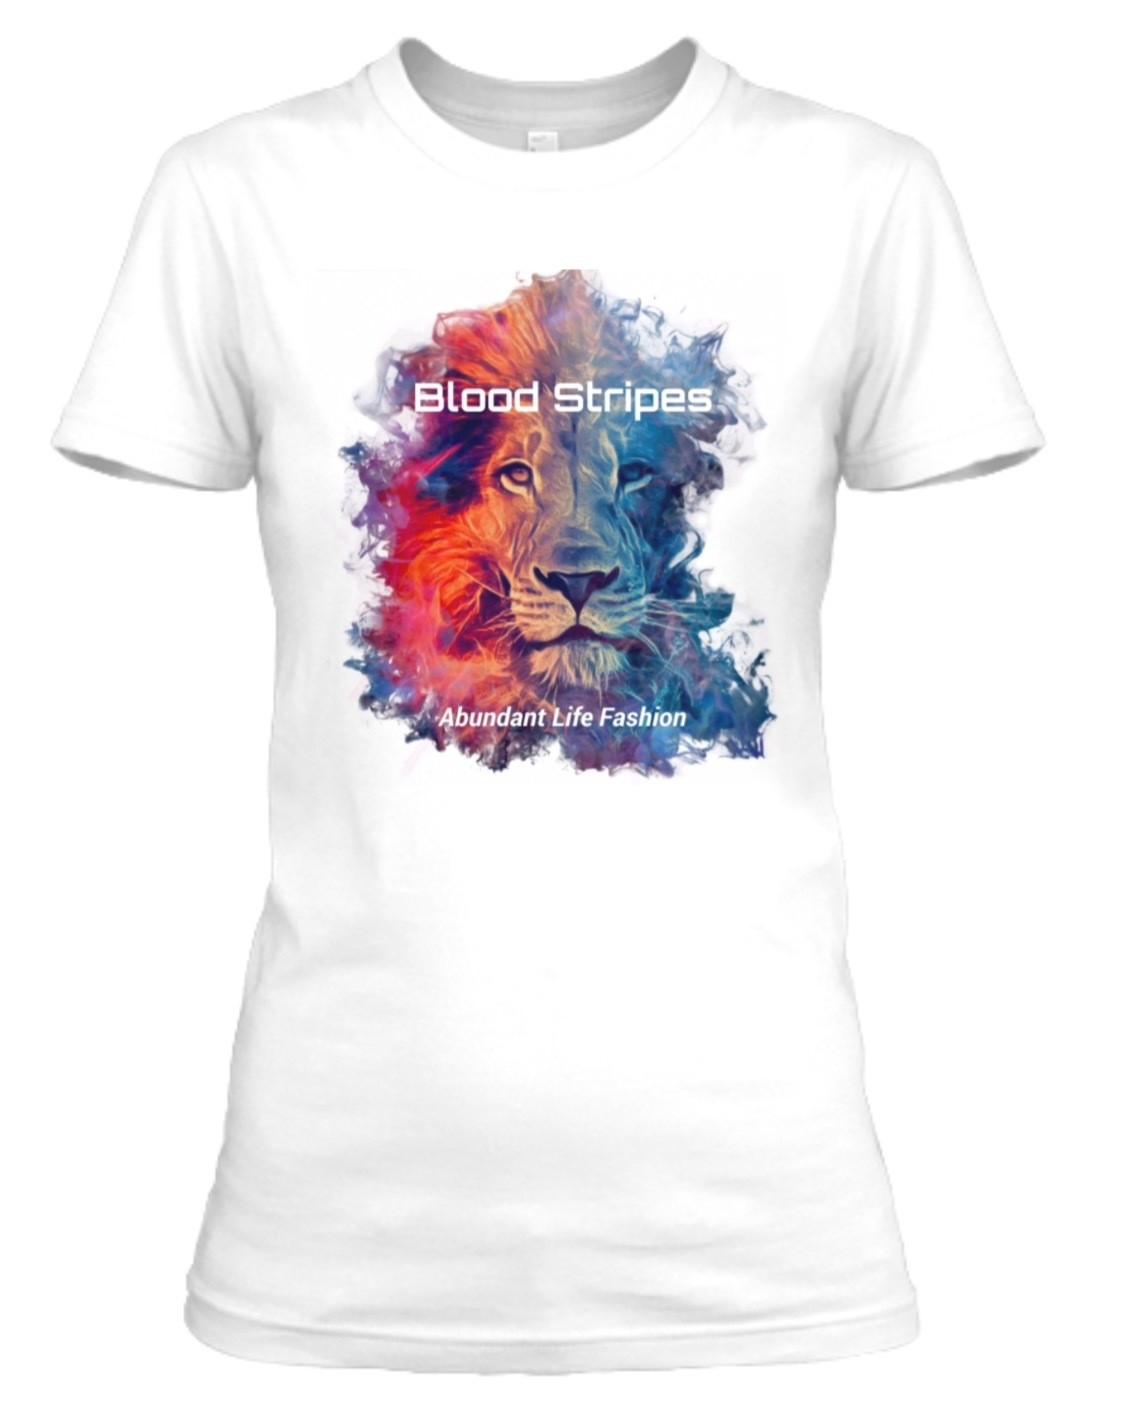 Bloodstripes lion x